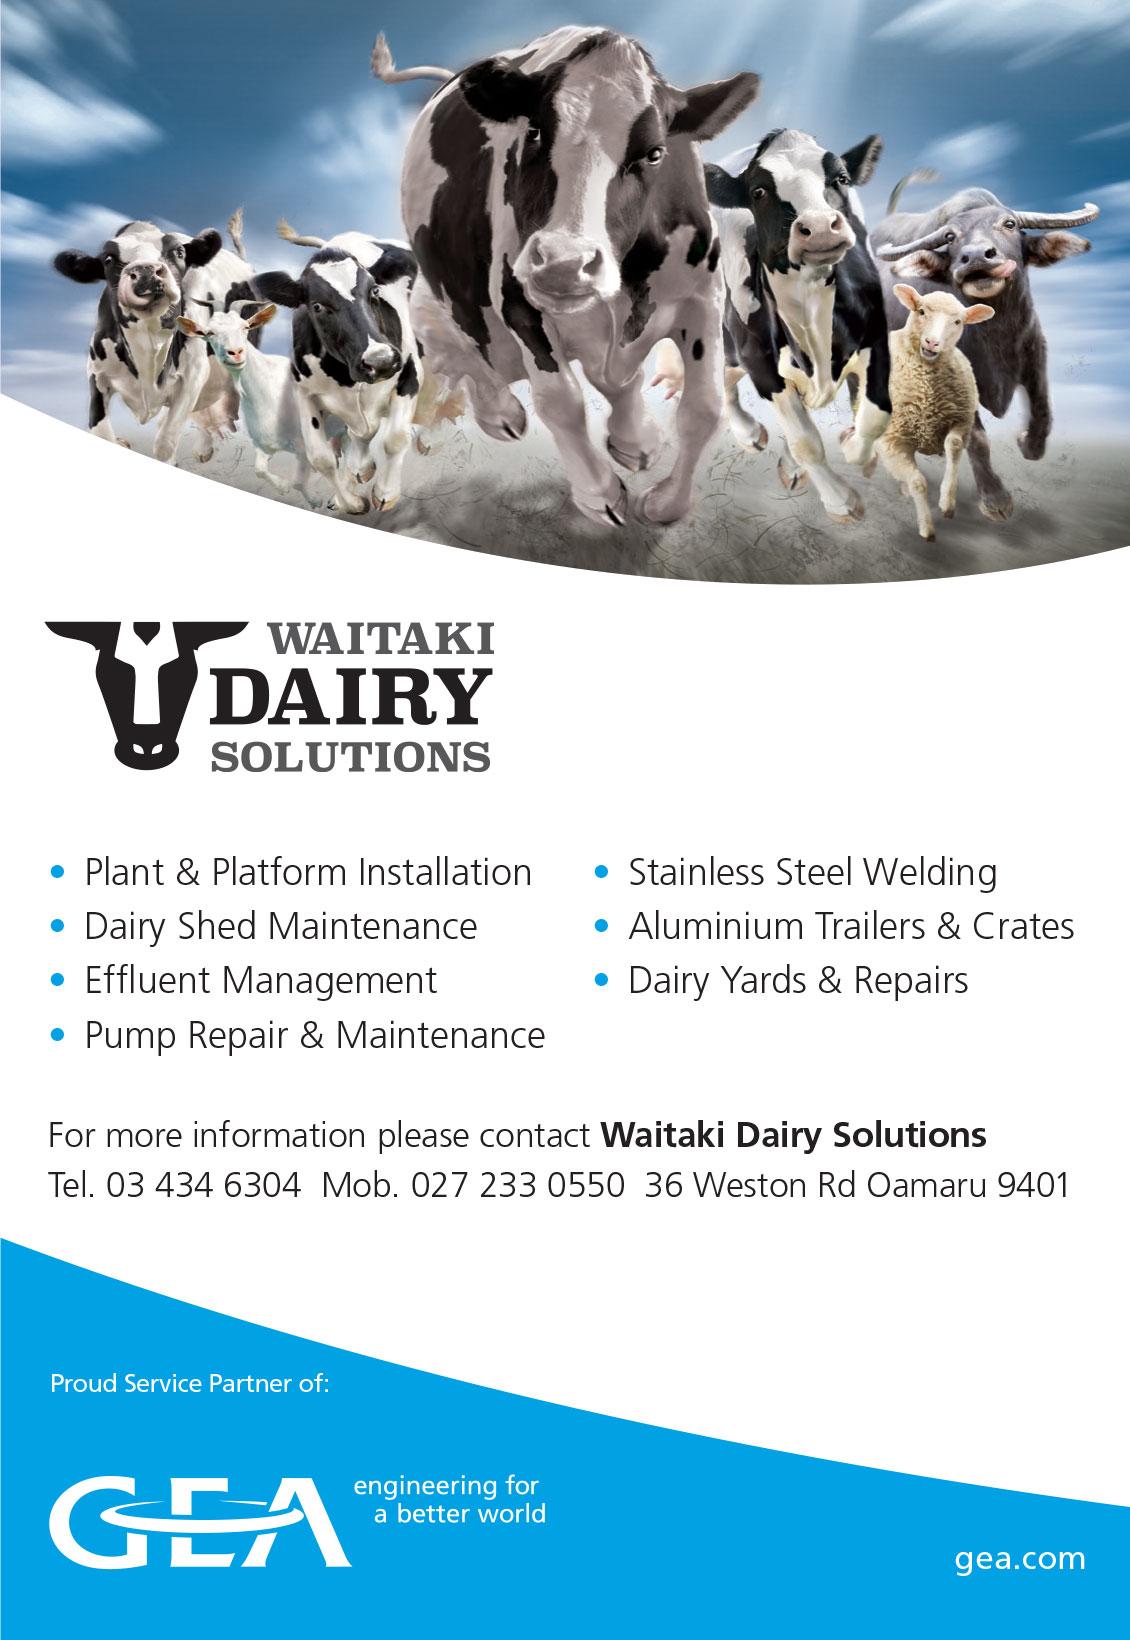 waitaki-dairy-solutions.jpg